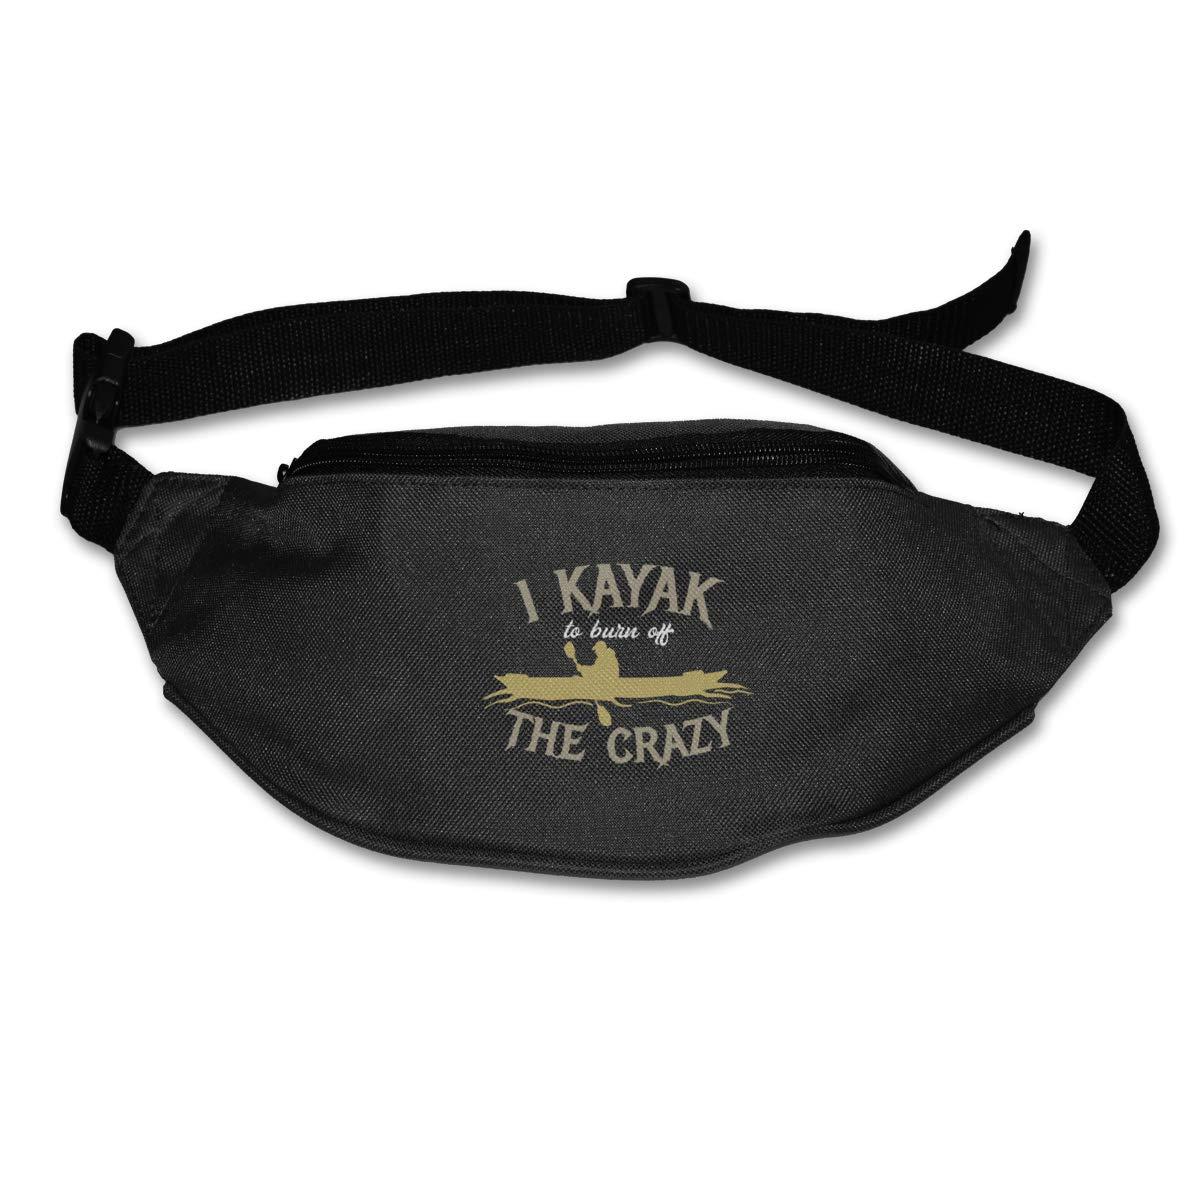 I Kayak To Burn Off The Crazy Sport Waist Packs Fanny Pack